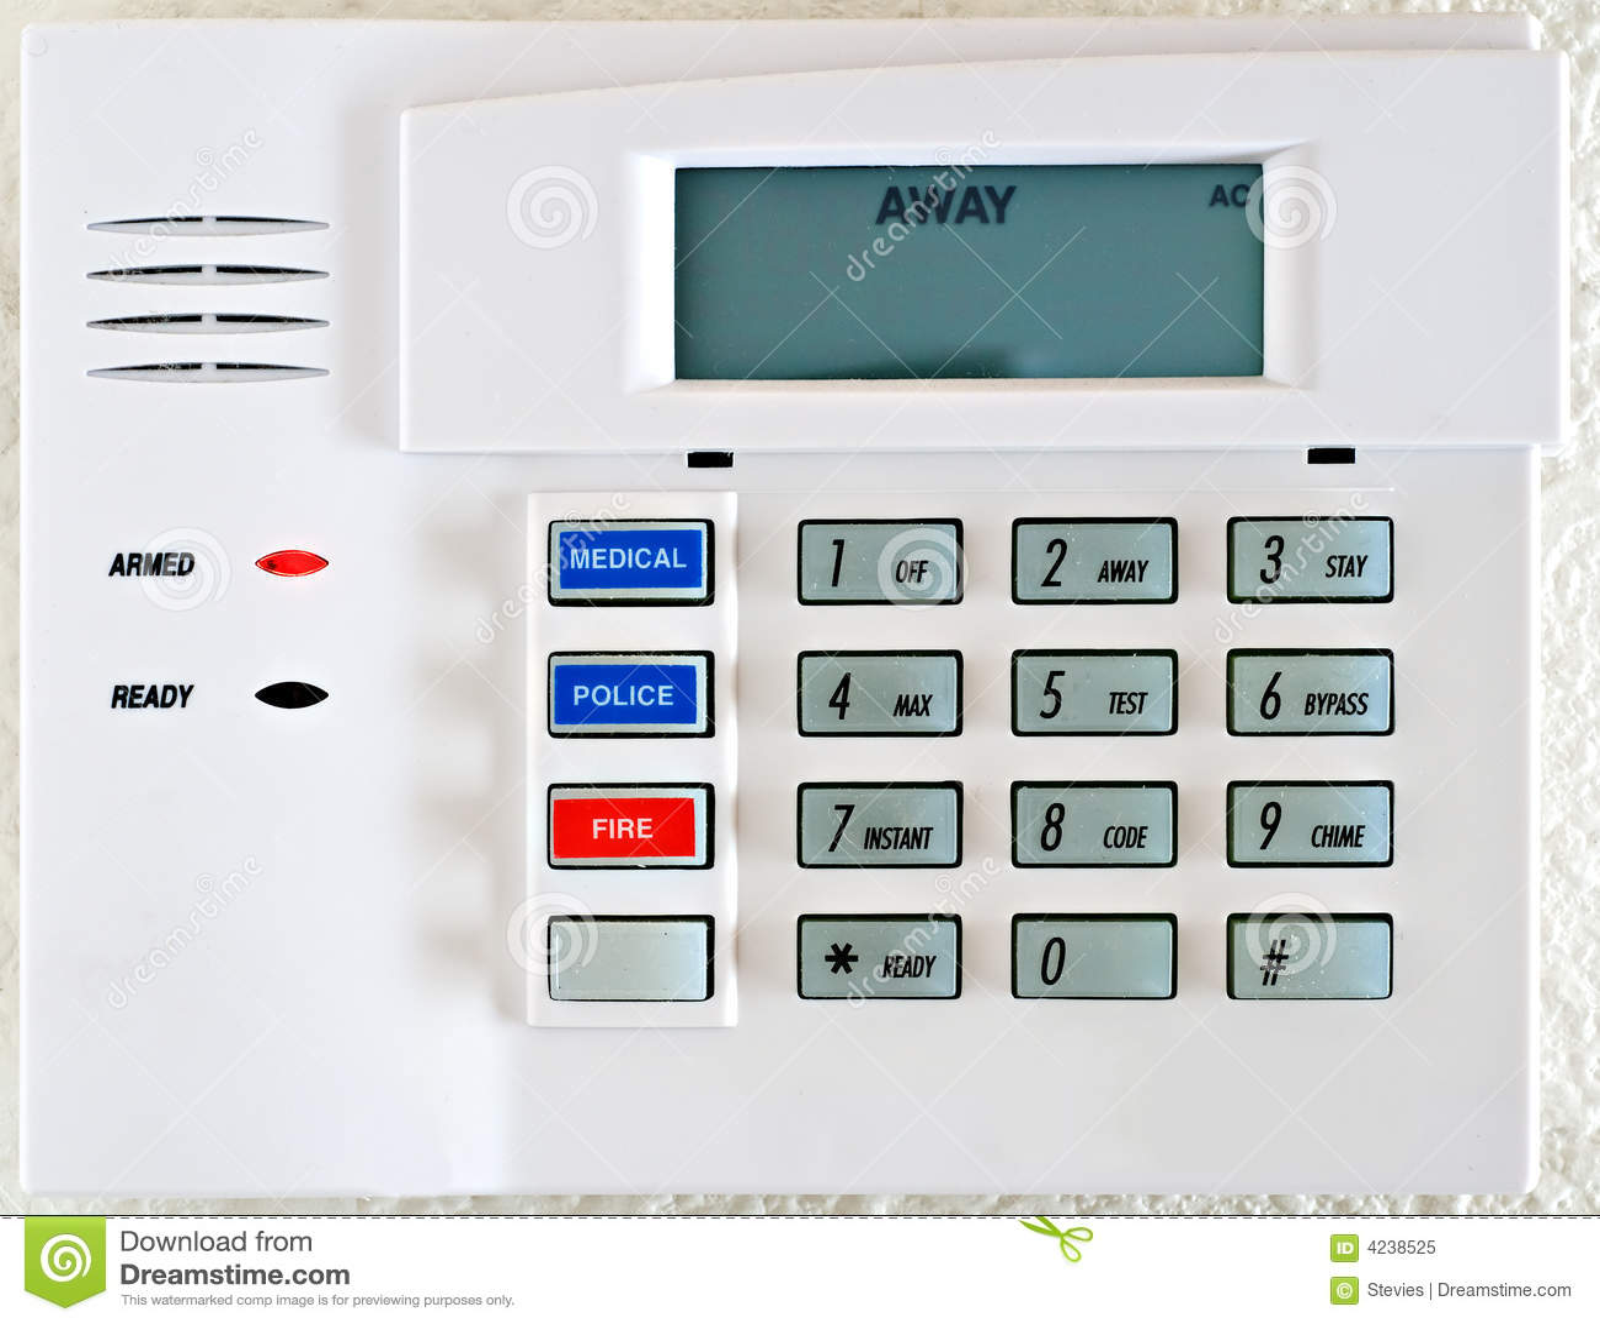 Stock Photo Residential Alarm System Keypad Stock Image